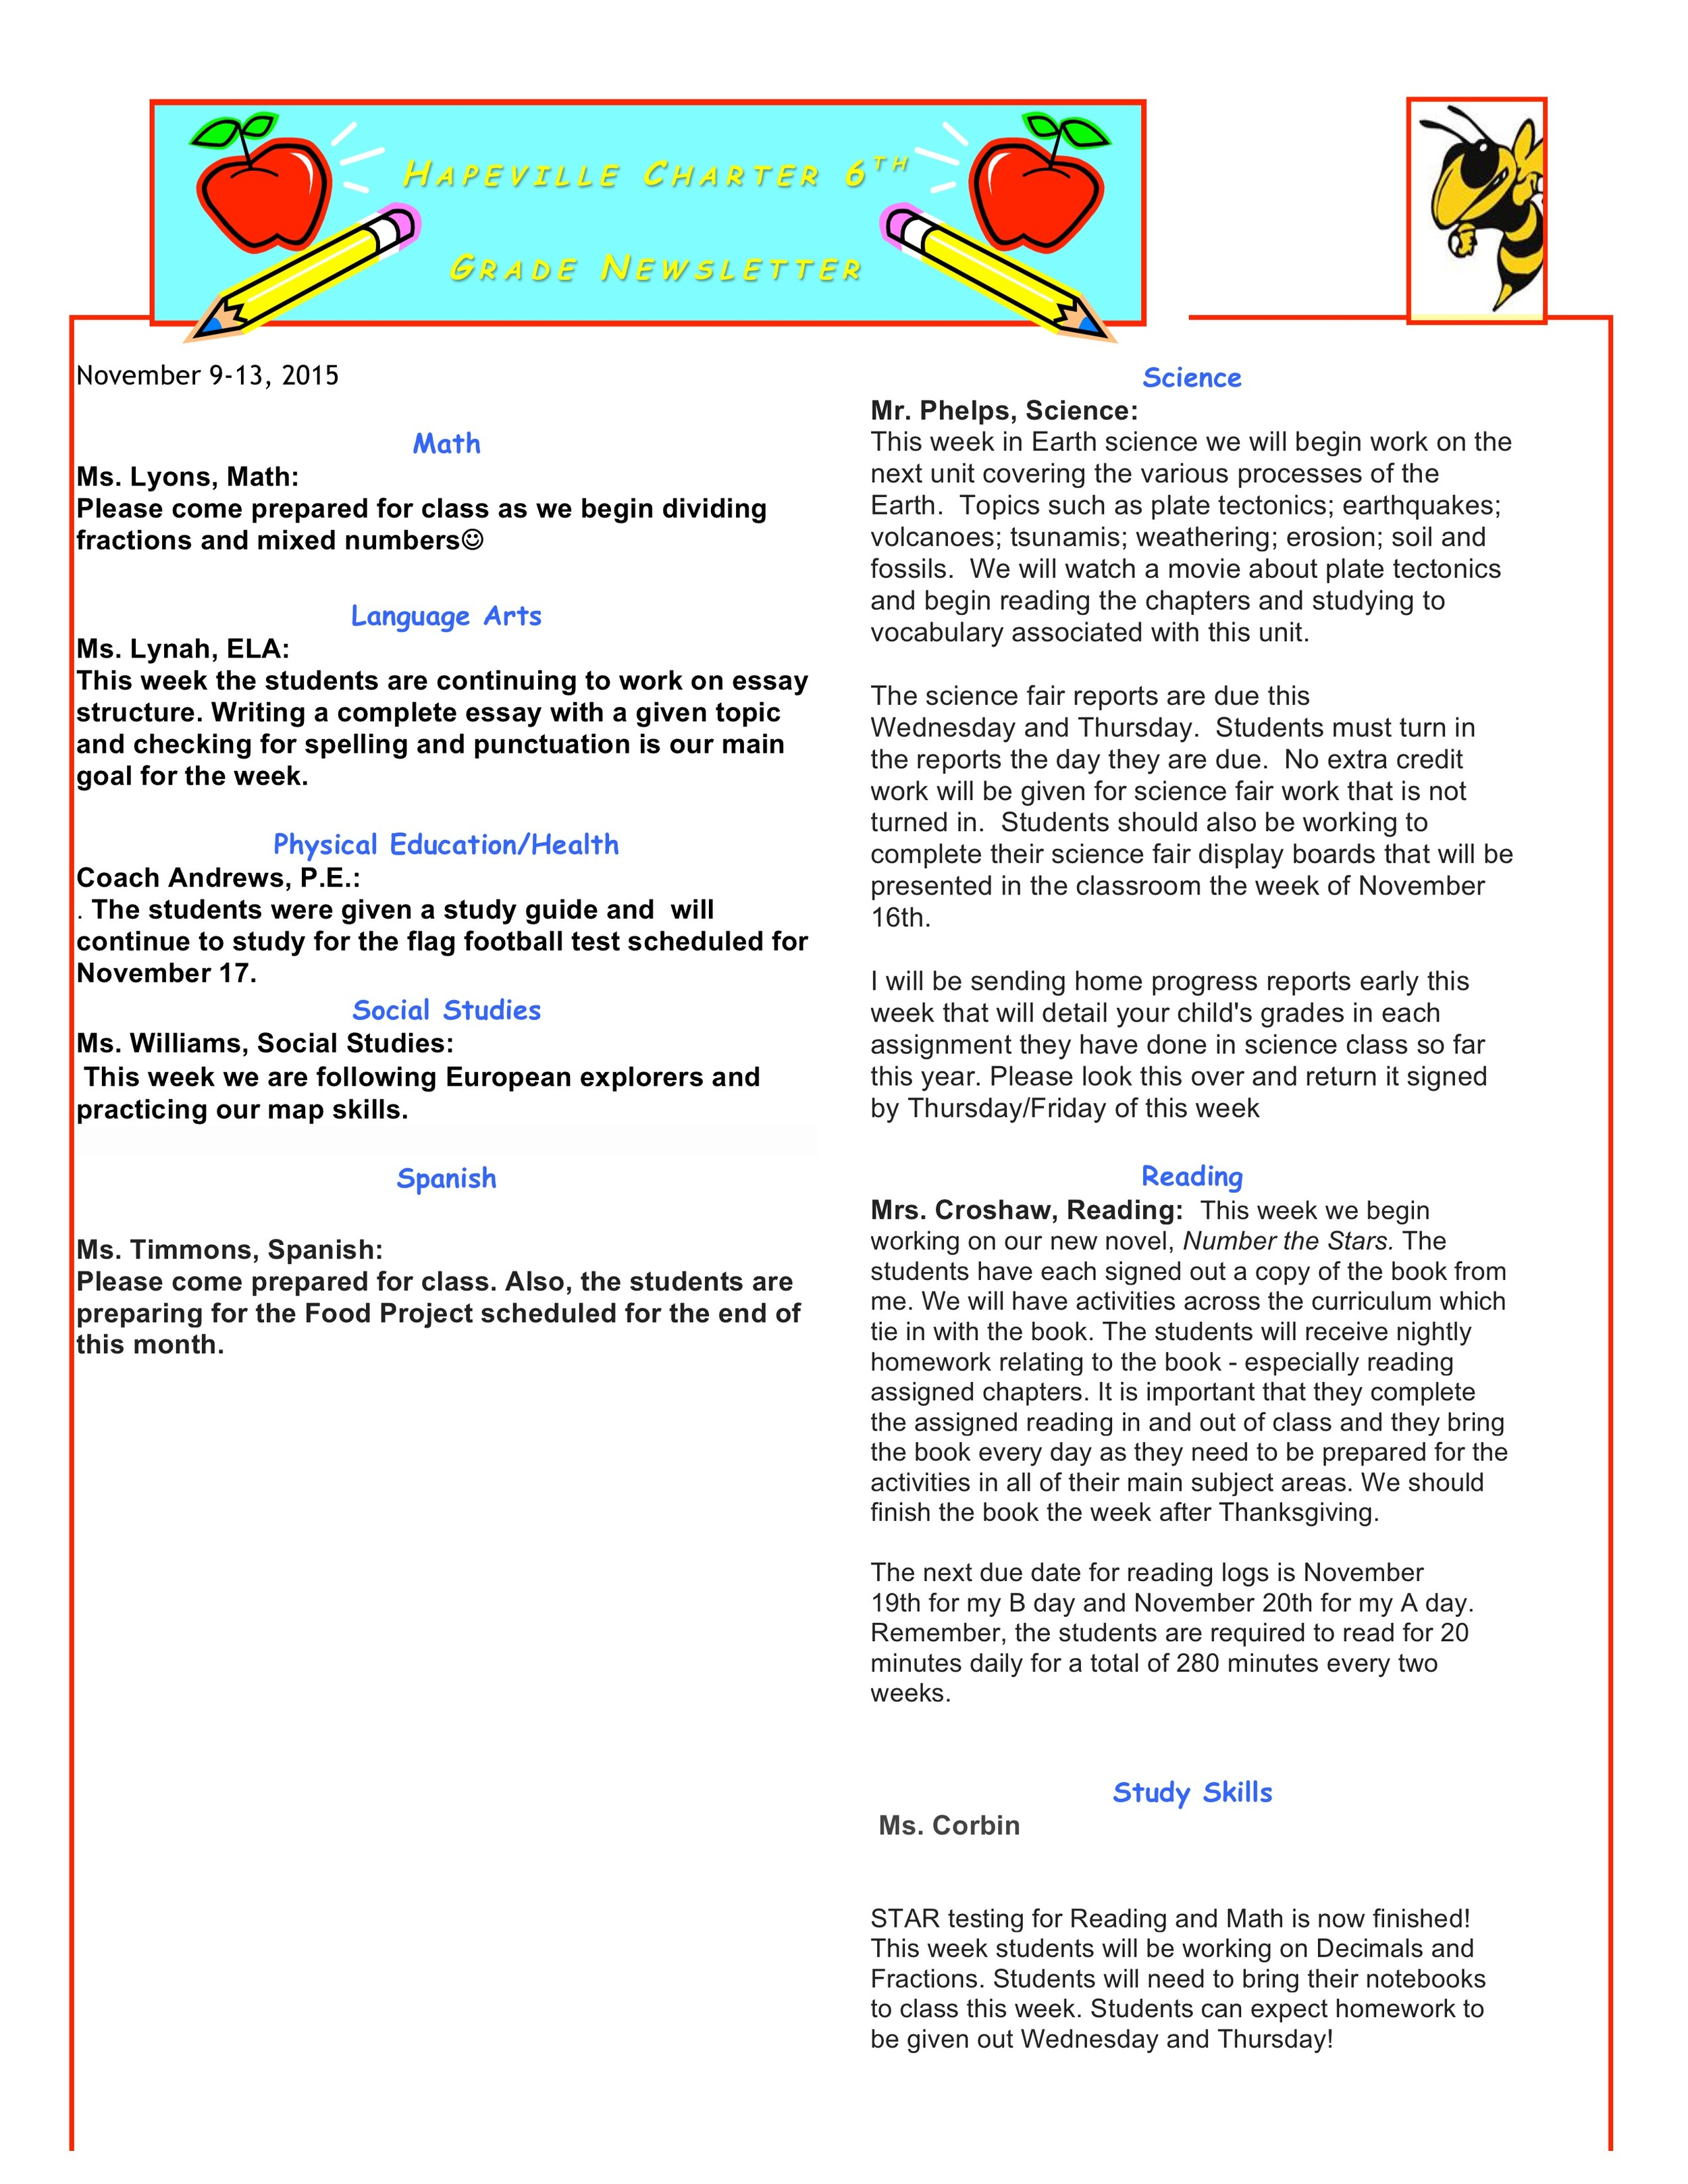 Newsletter Image6th grade Nov 9.jpeg